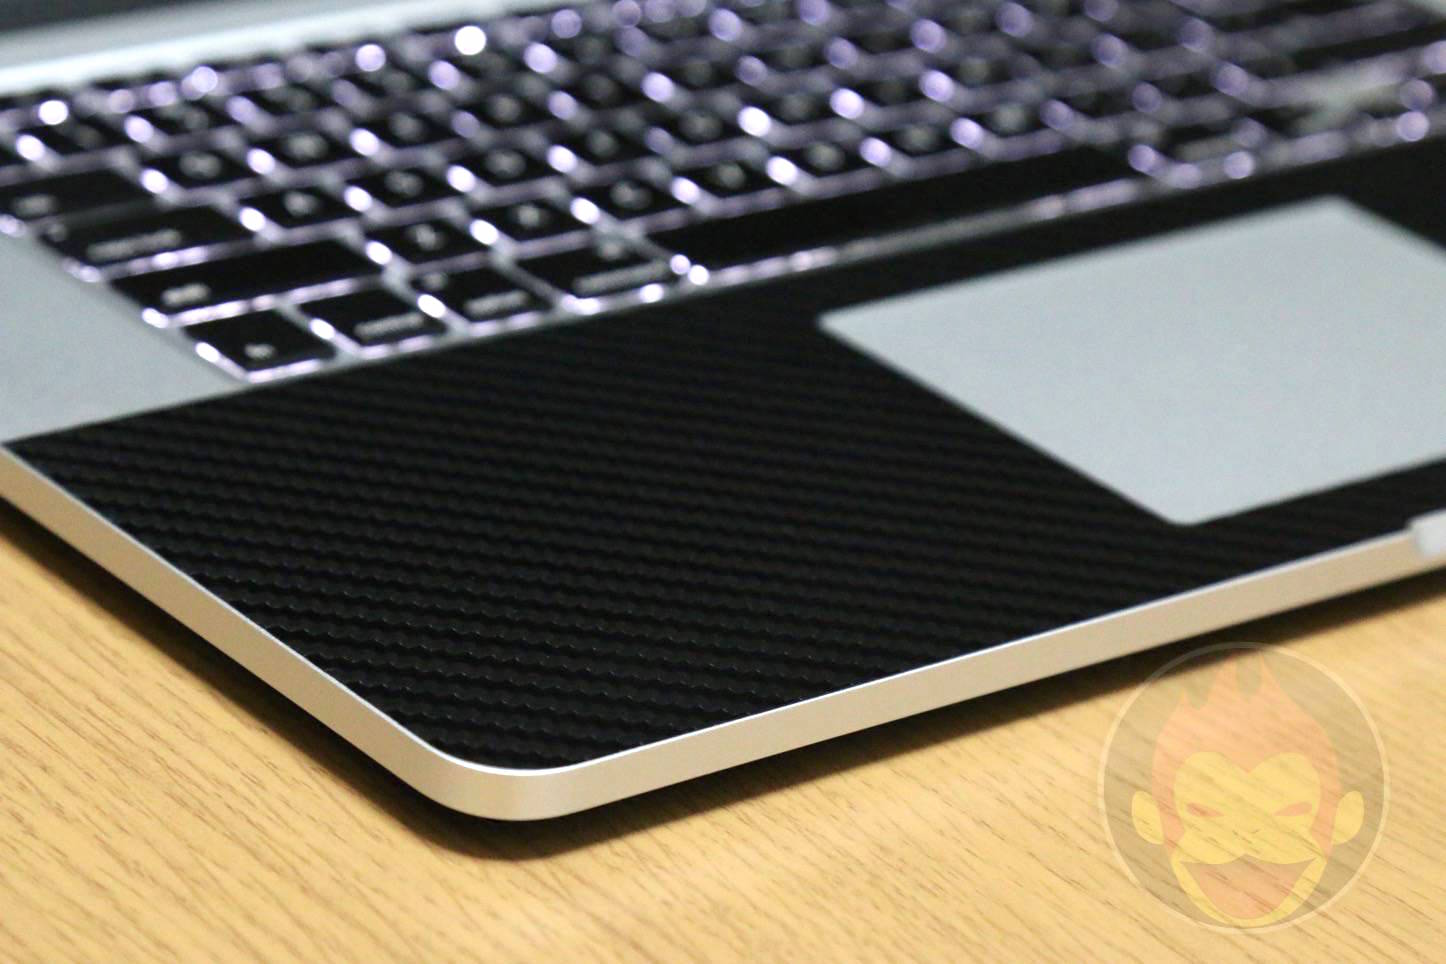 wraplus-for-Macbook-Pro-Retina-15-25.JPG